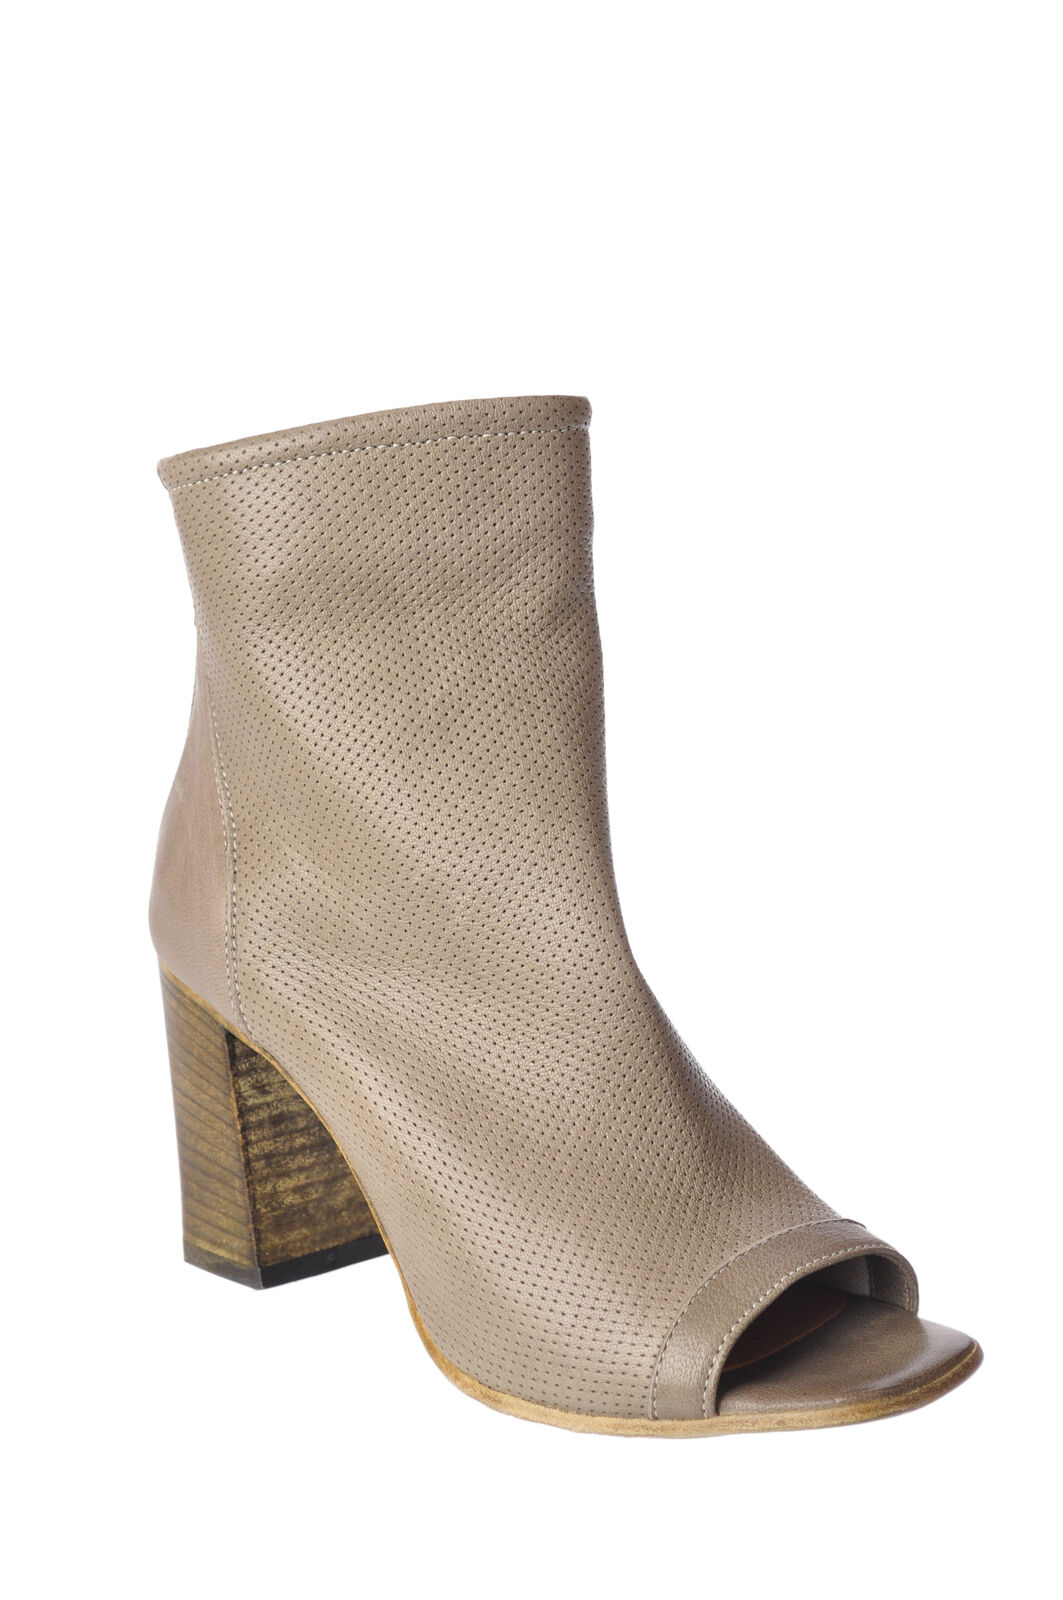 esclusivo Lemarè    -  Ankle stivali - Female - Beige - 1894615A183744  wholesape economico